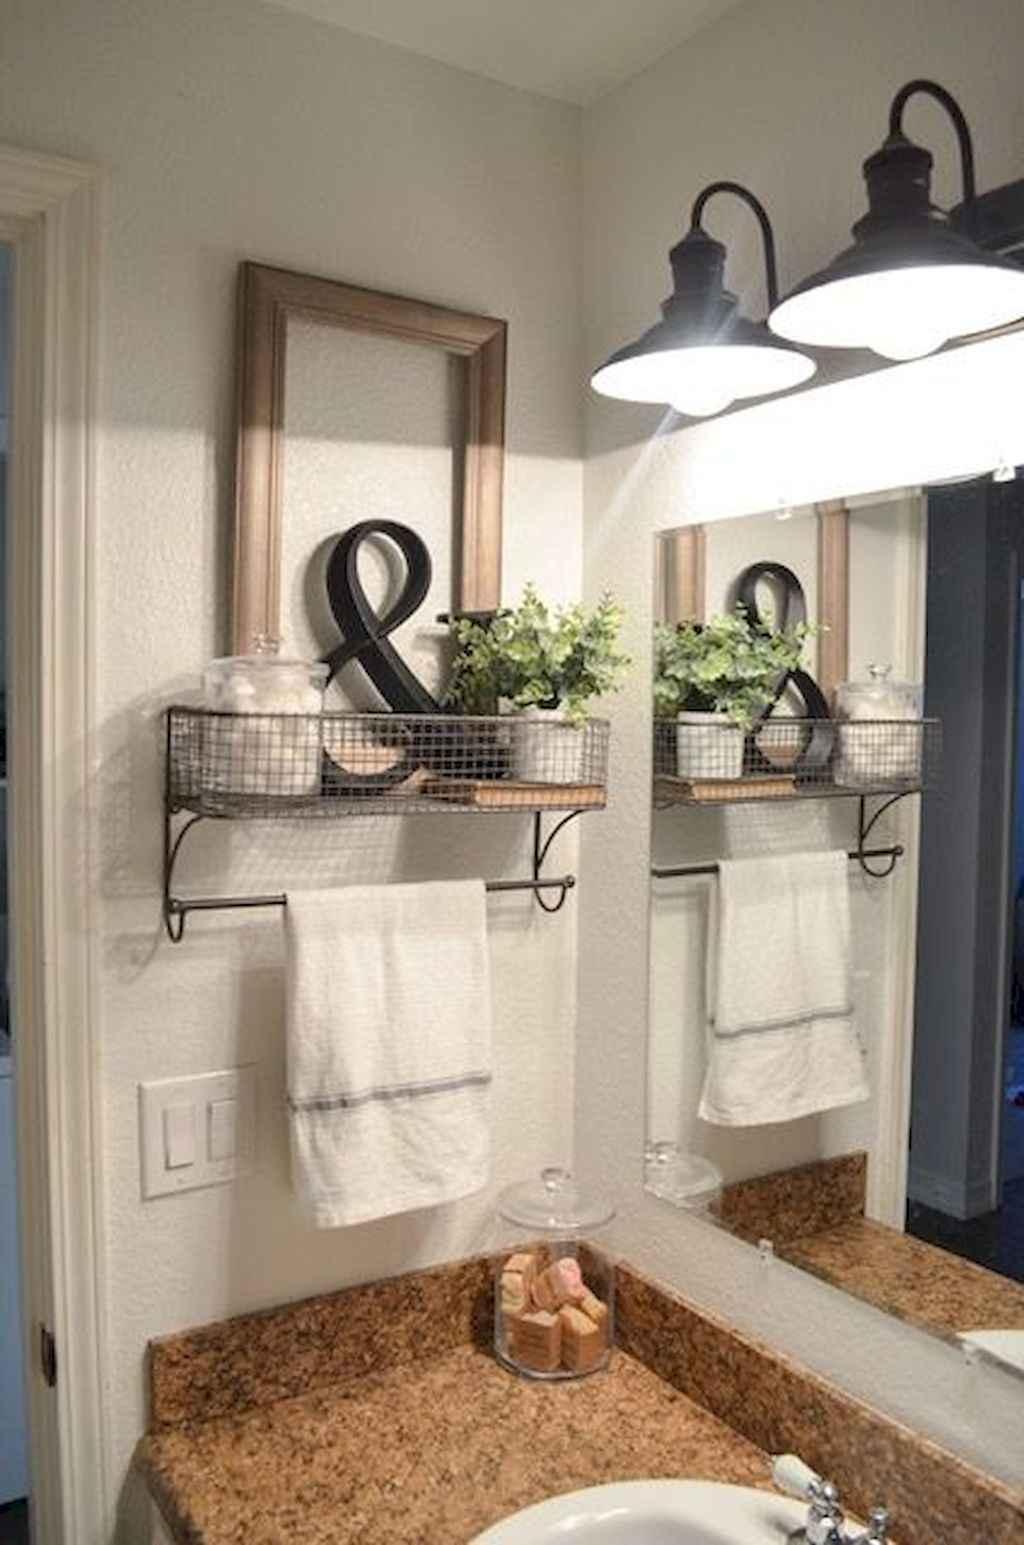 50 rustic farmhouse master bathroom remodel ideas (46) - Roomadness.com